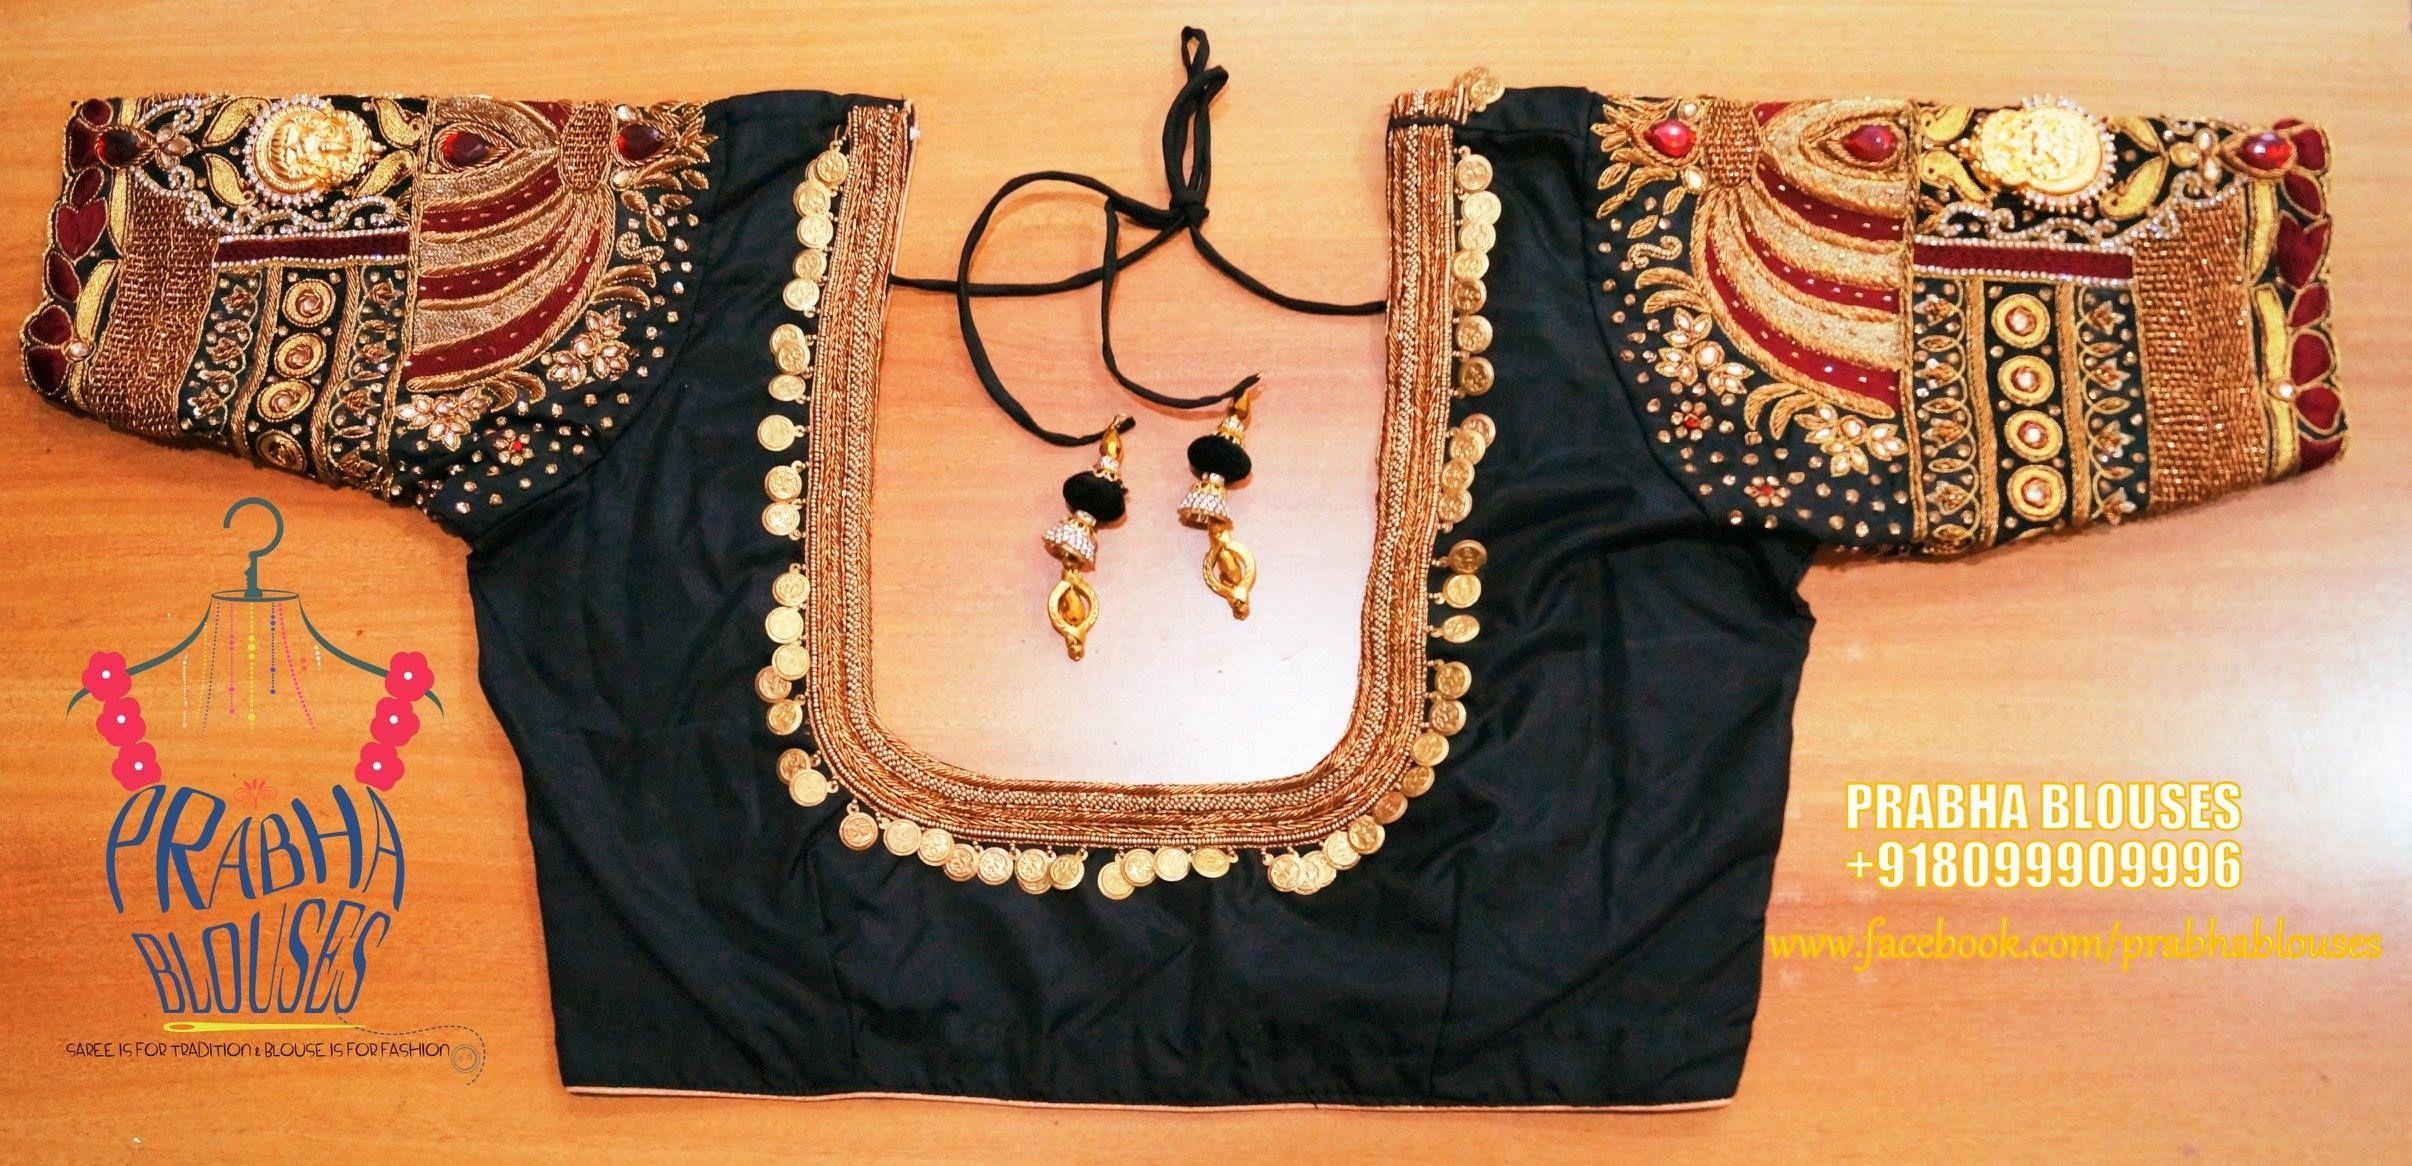 46343b696714a Prabha blouses. Hyderabad. 12-6-211 3 viveknagar kukatpally. Contact    080999 09996. Email   prabha.blouses gmail.com.